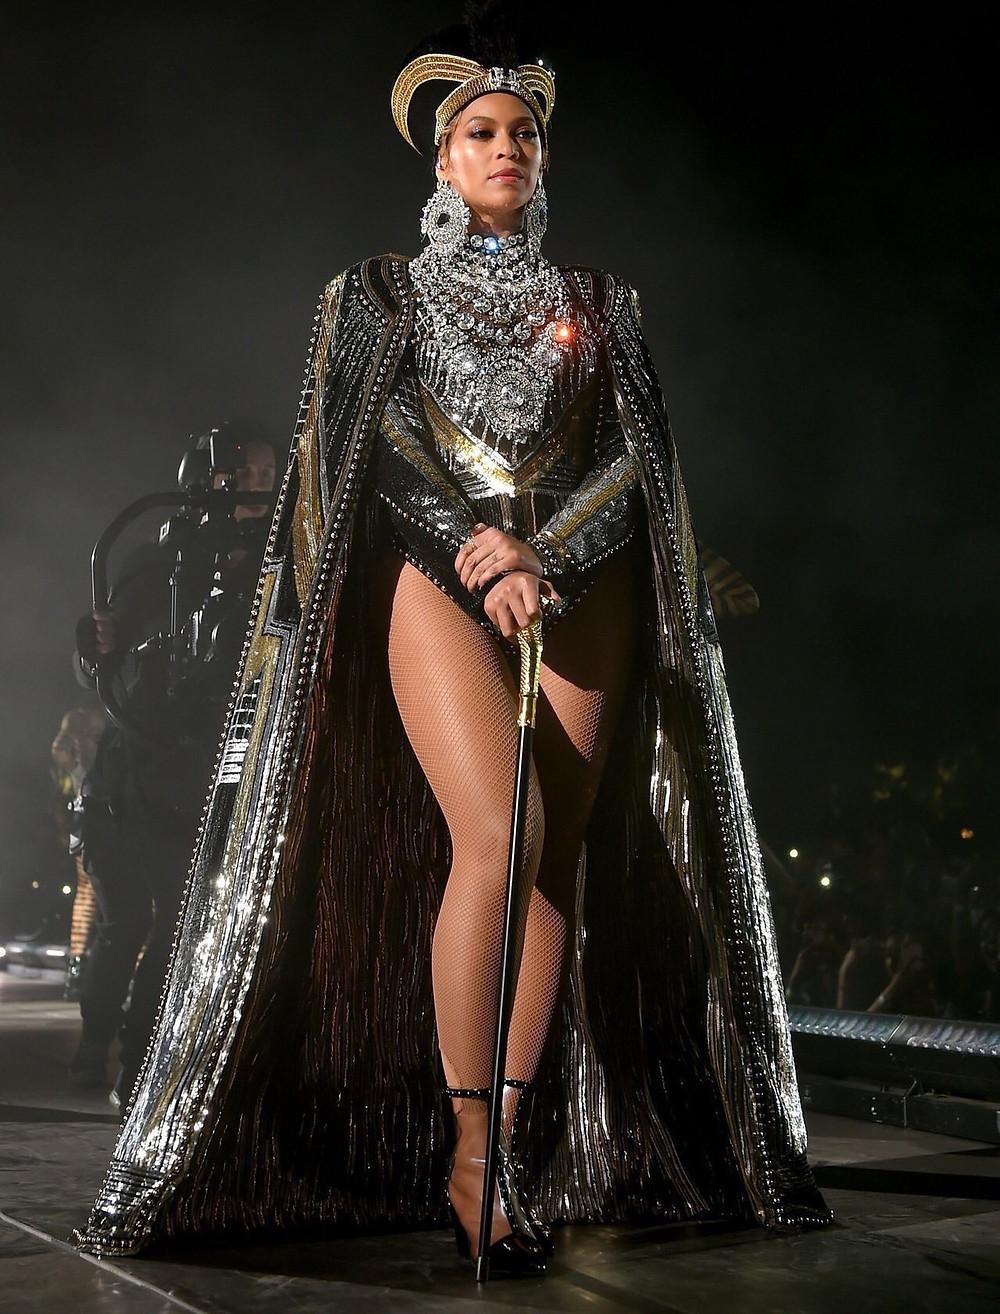 Cleopatra Beyonce